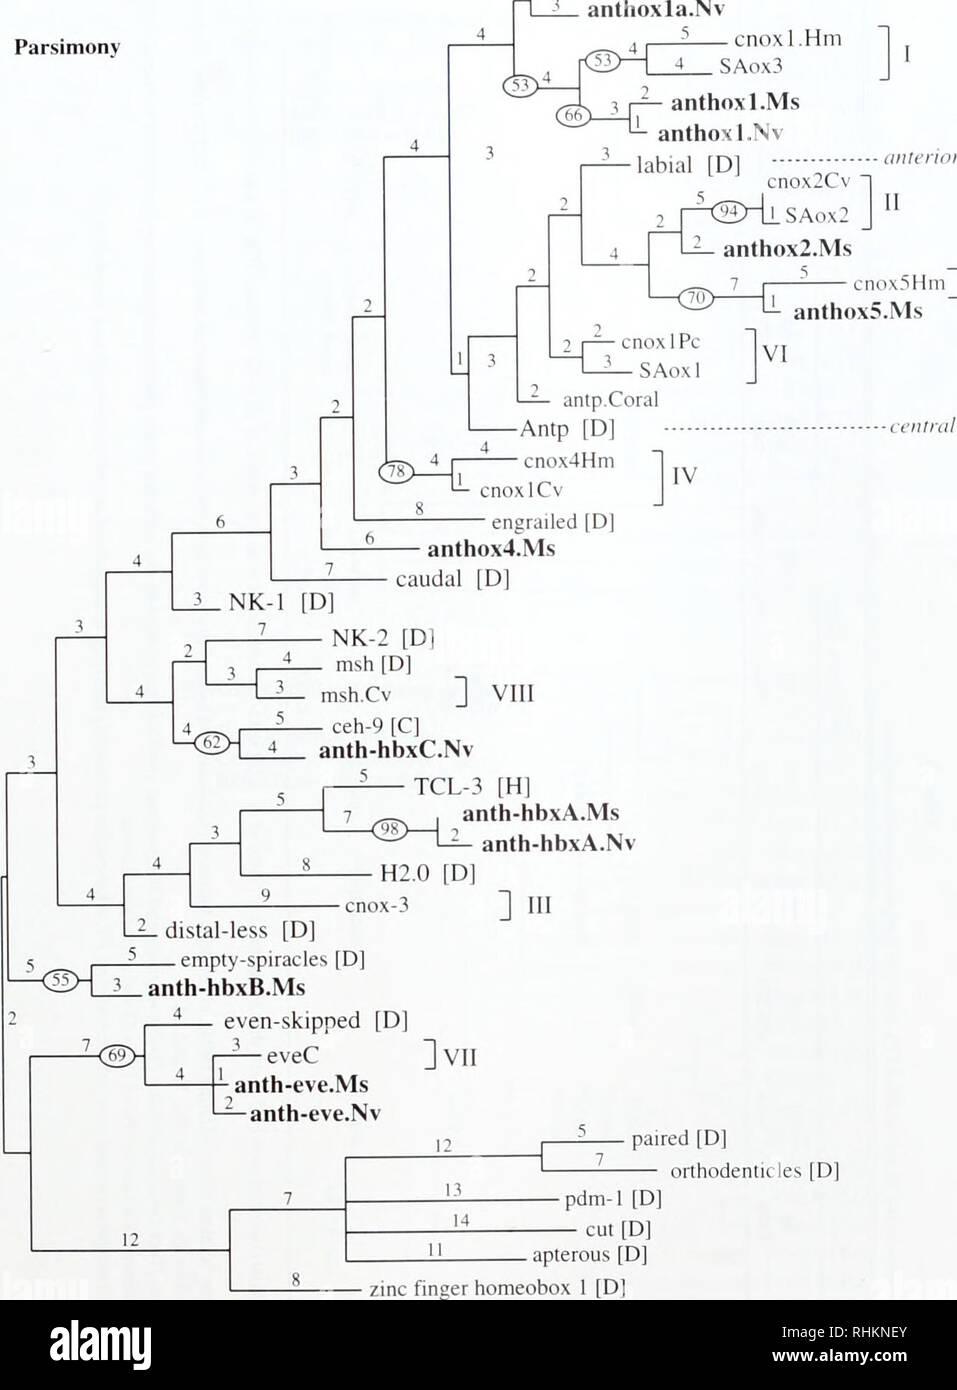 hight resolution of la biolog a zoolog a biolog a biolog a marina pdm 1 d cut d d orthodenticles